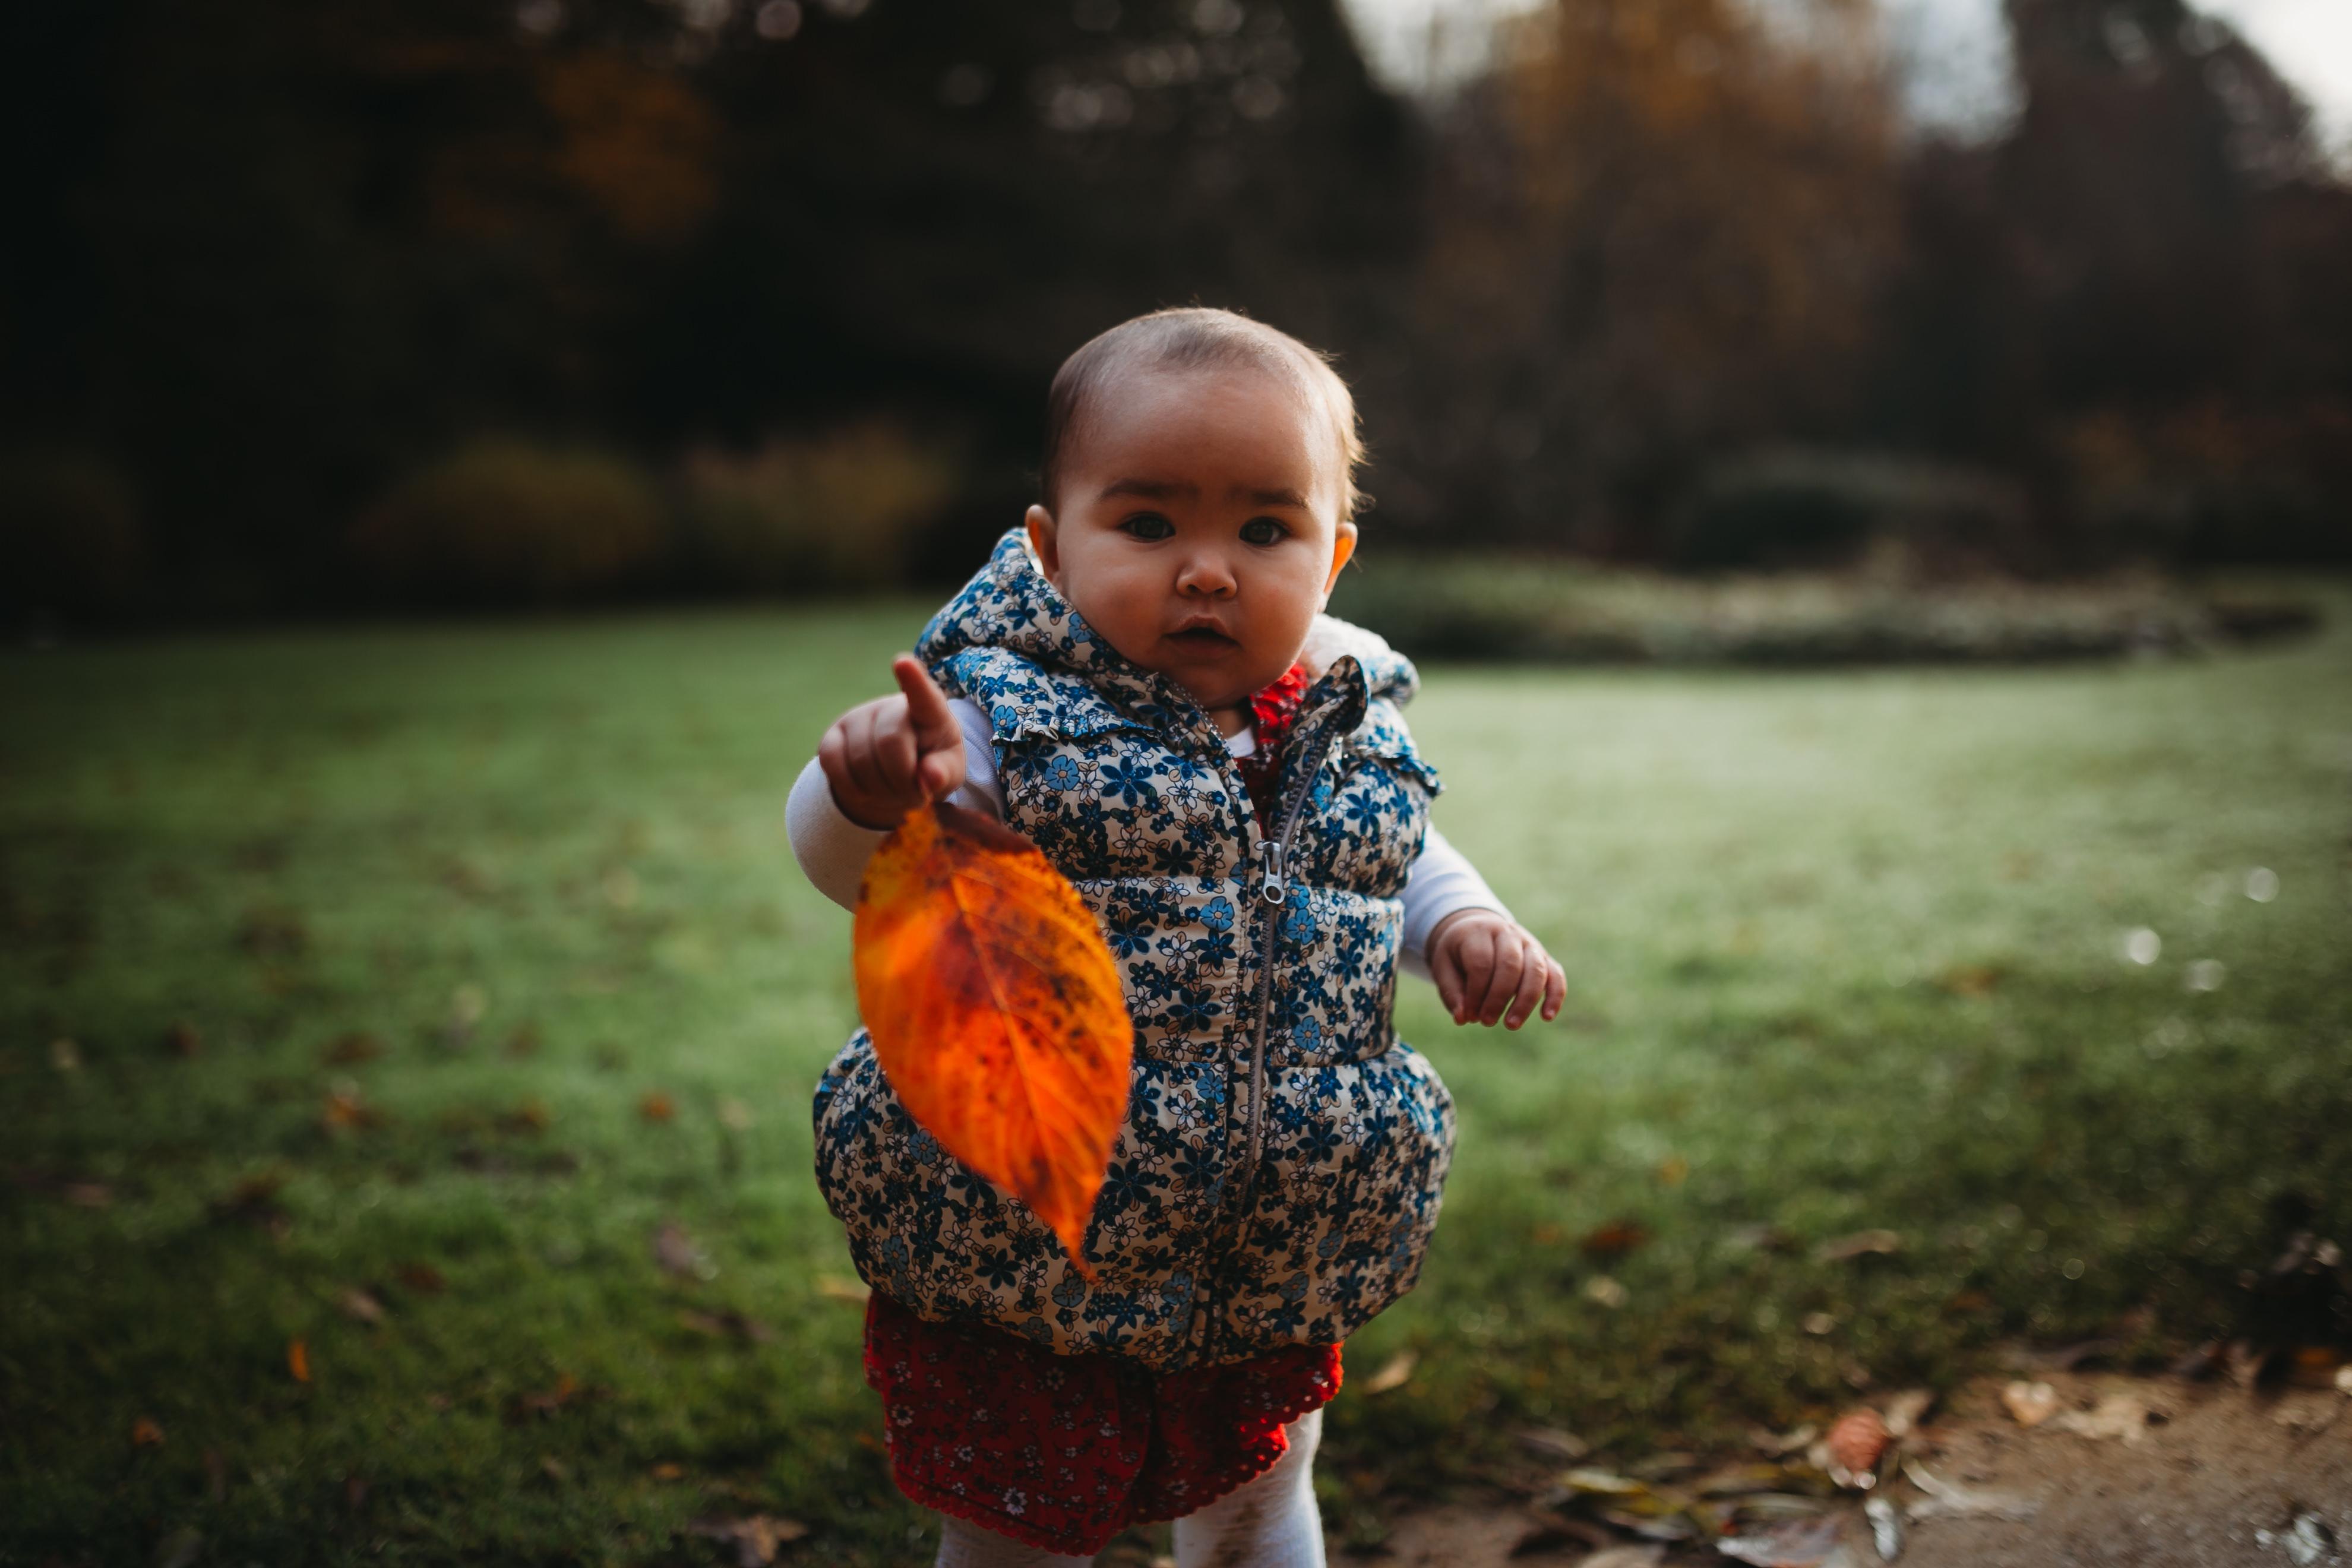 Reading University Harris Gardens - Autumn Sapna Odlin Photography